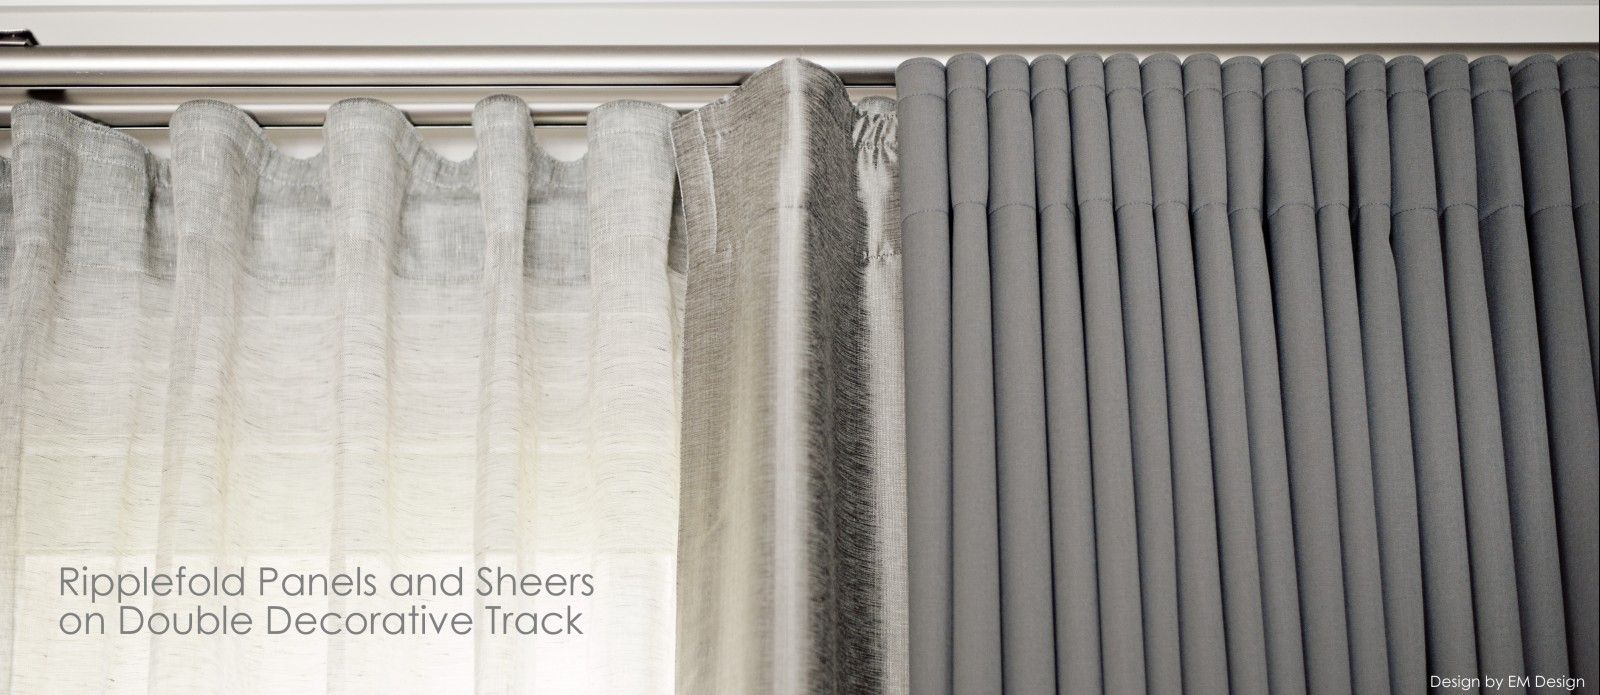 custom drapery curtain panels with ripplefold sheers and ripplefold drapery  panels on metal pewter decorative hardware in mississauga living room